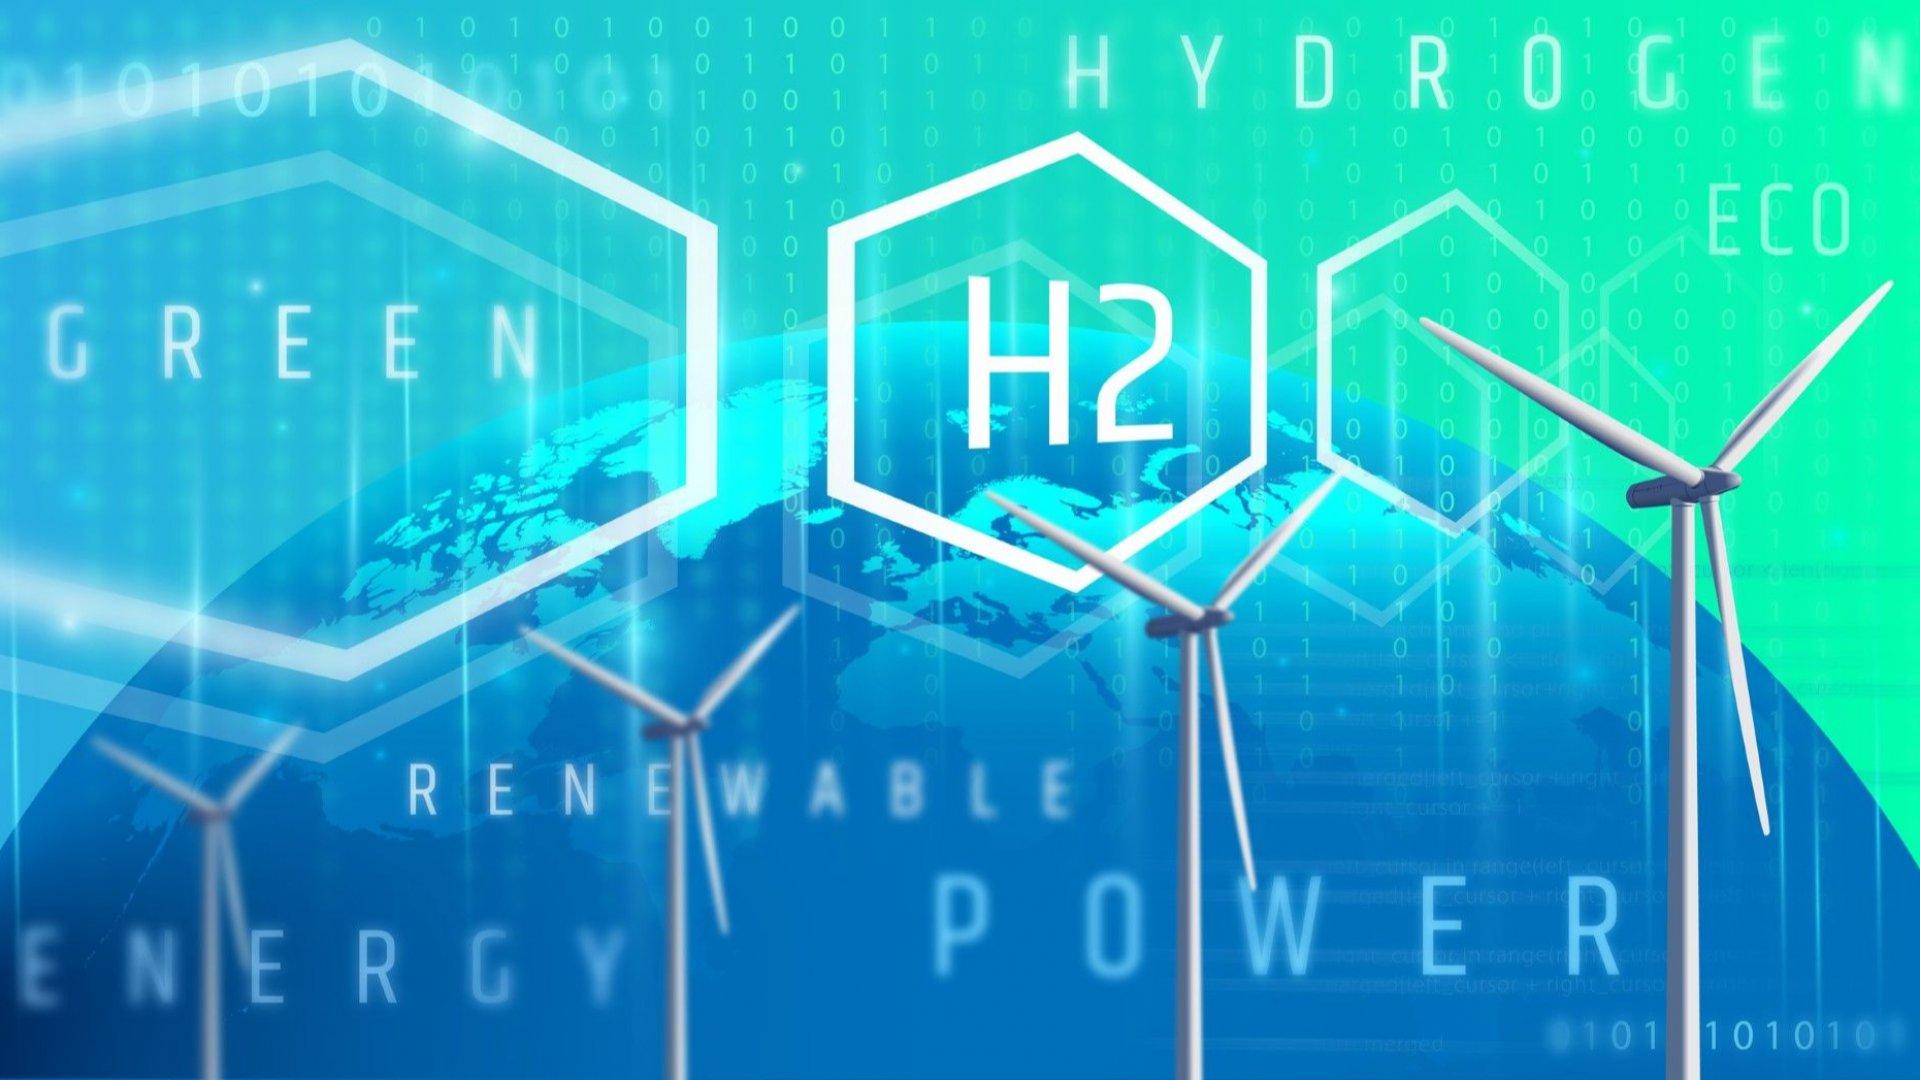 Поредната климатично-неутрална утопия: водород вместо газ